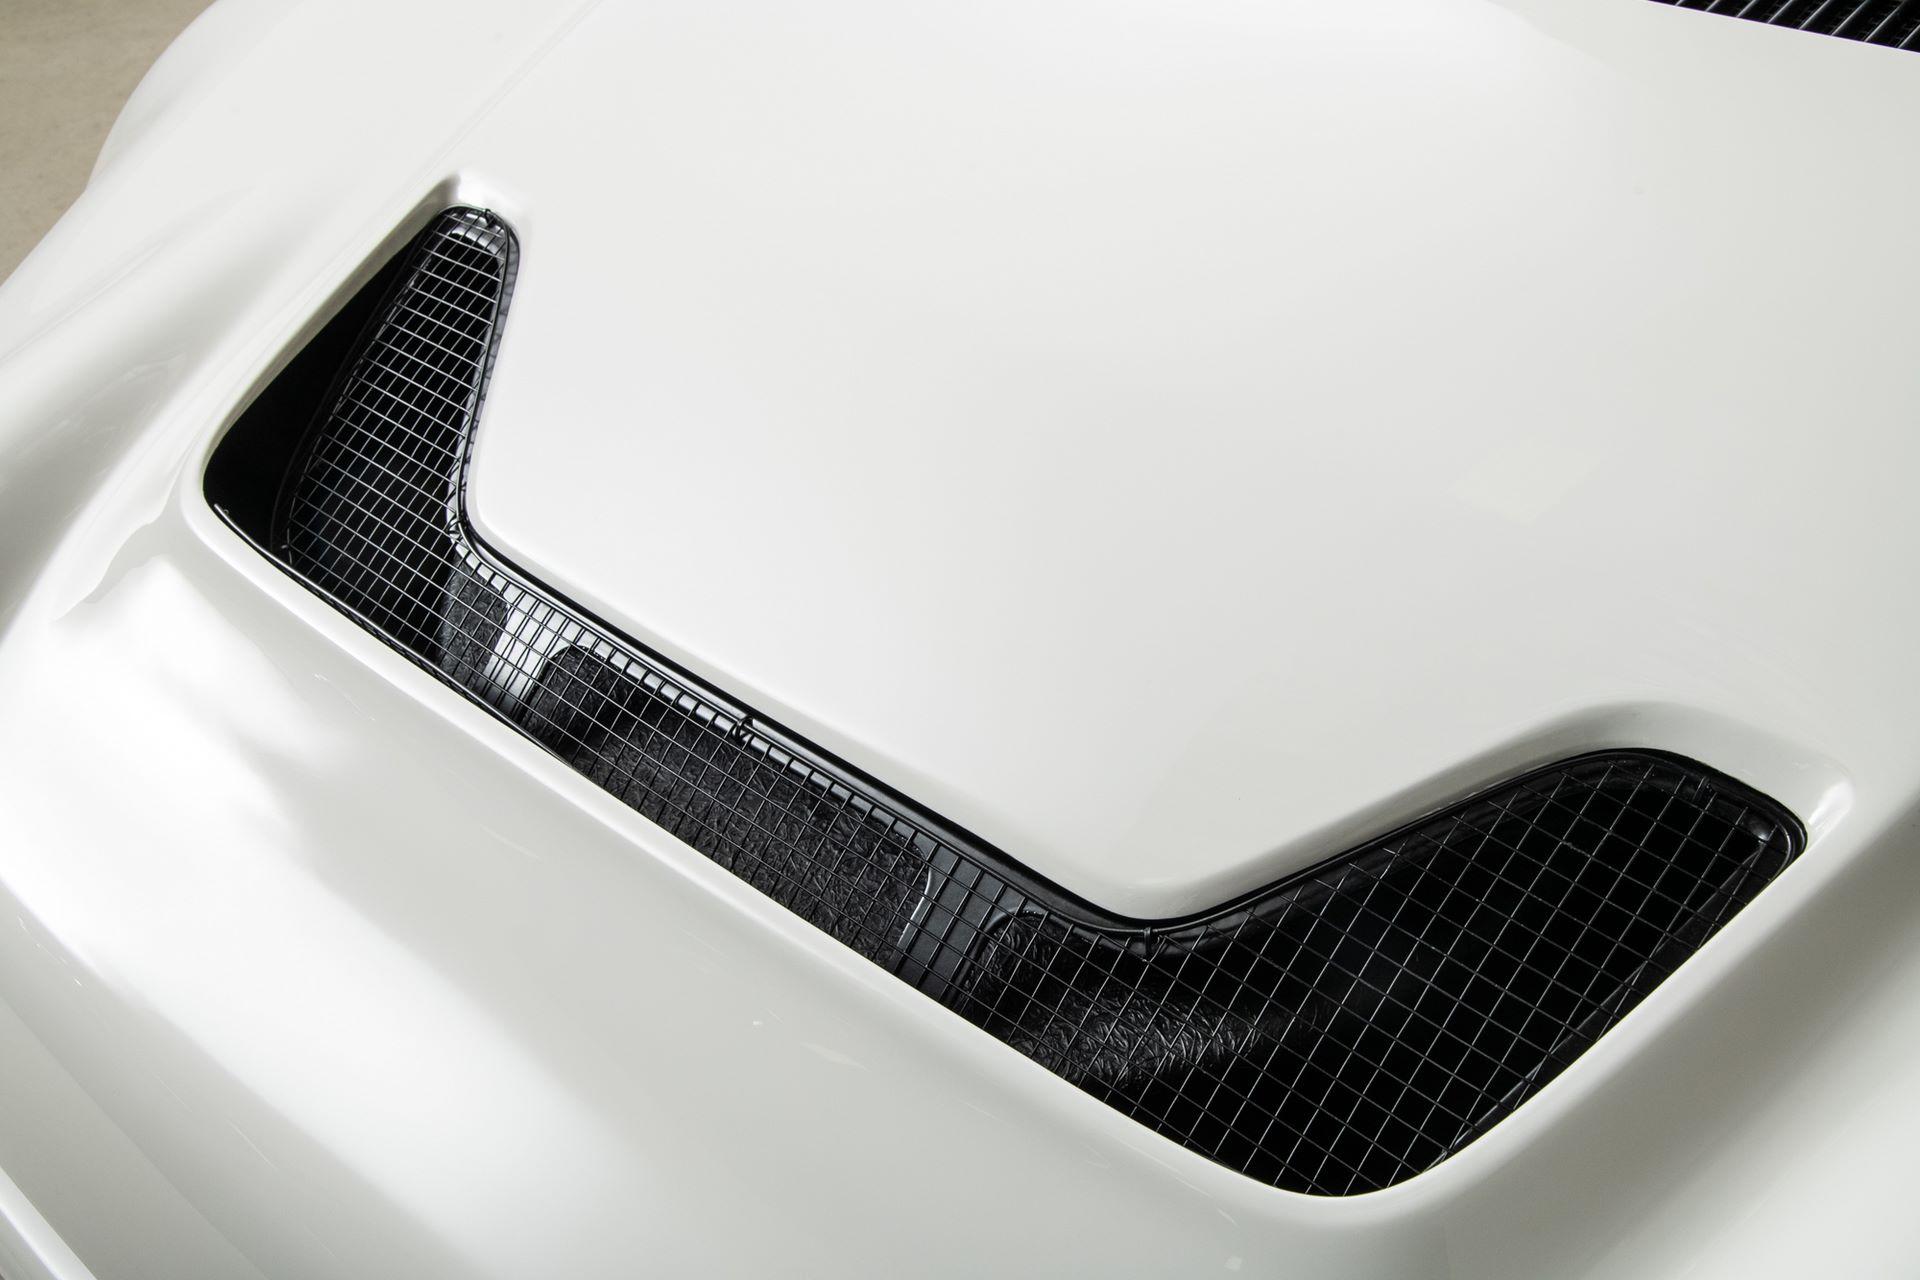 Ford-RS200-Evolution-Evo-for-sale-42